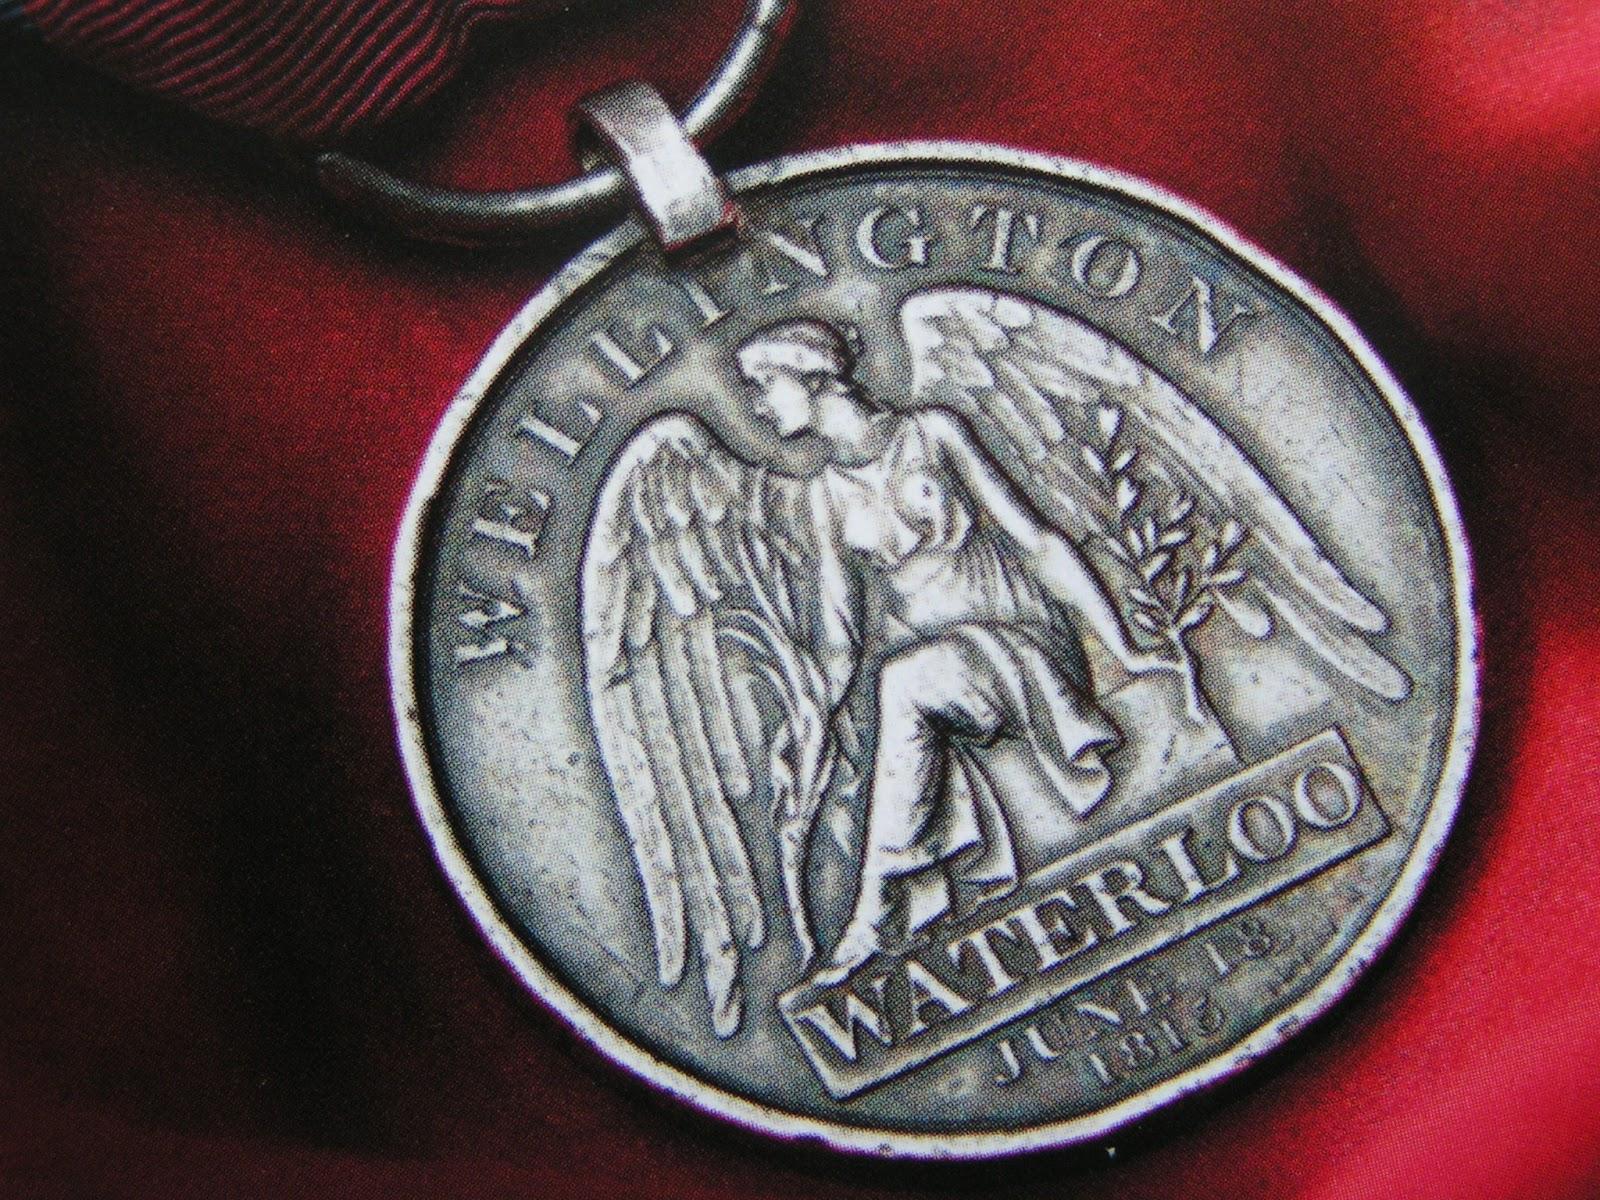 Campaign 2012 >> Waterloo Medal